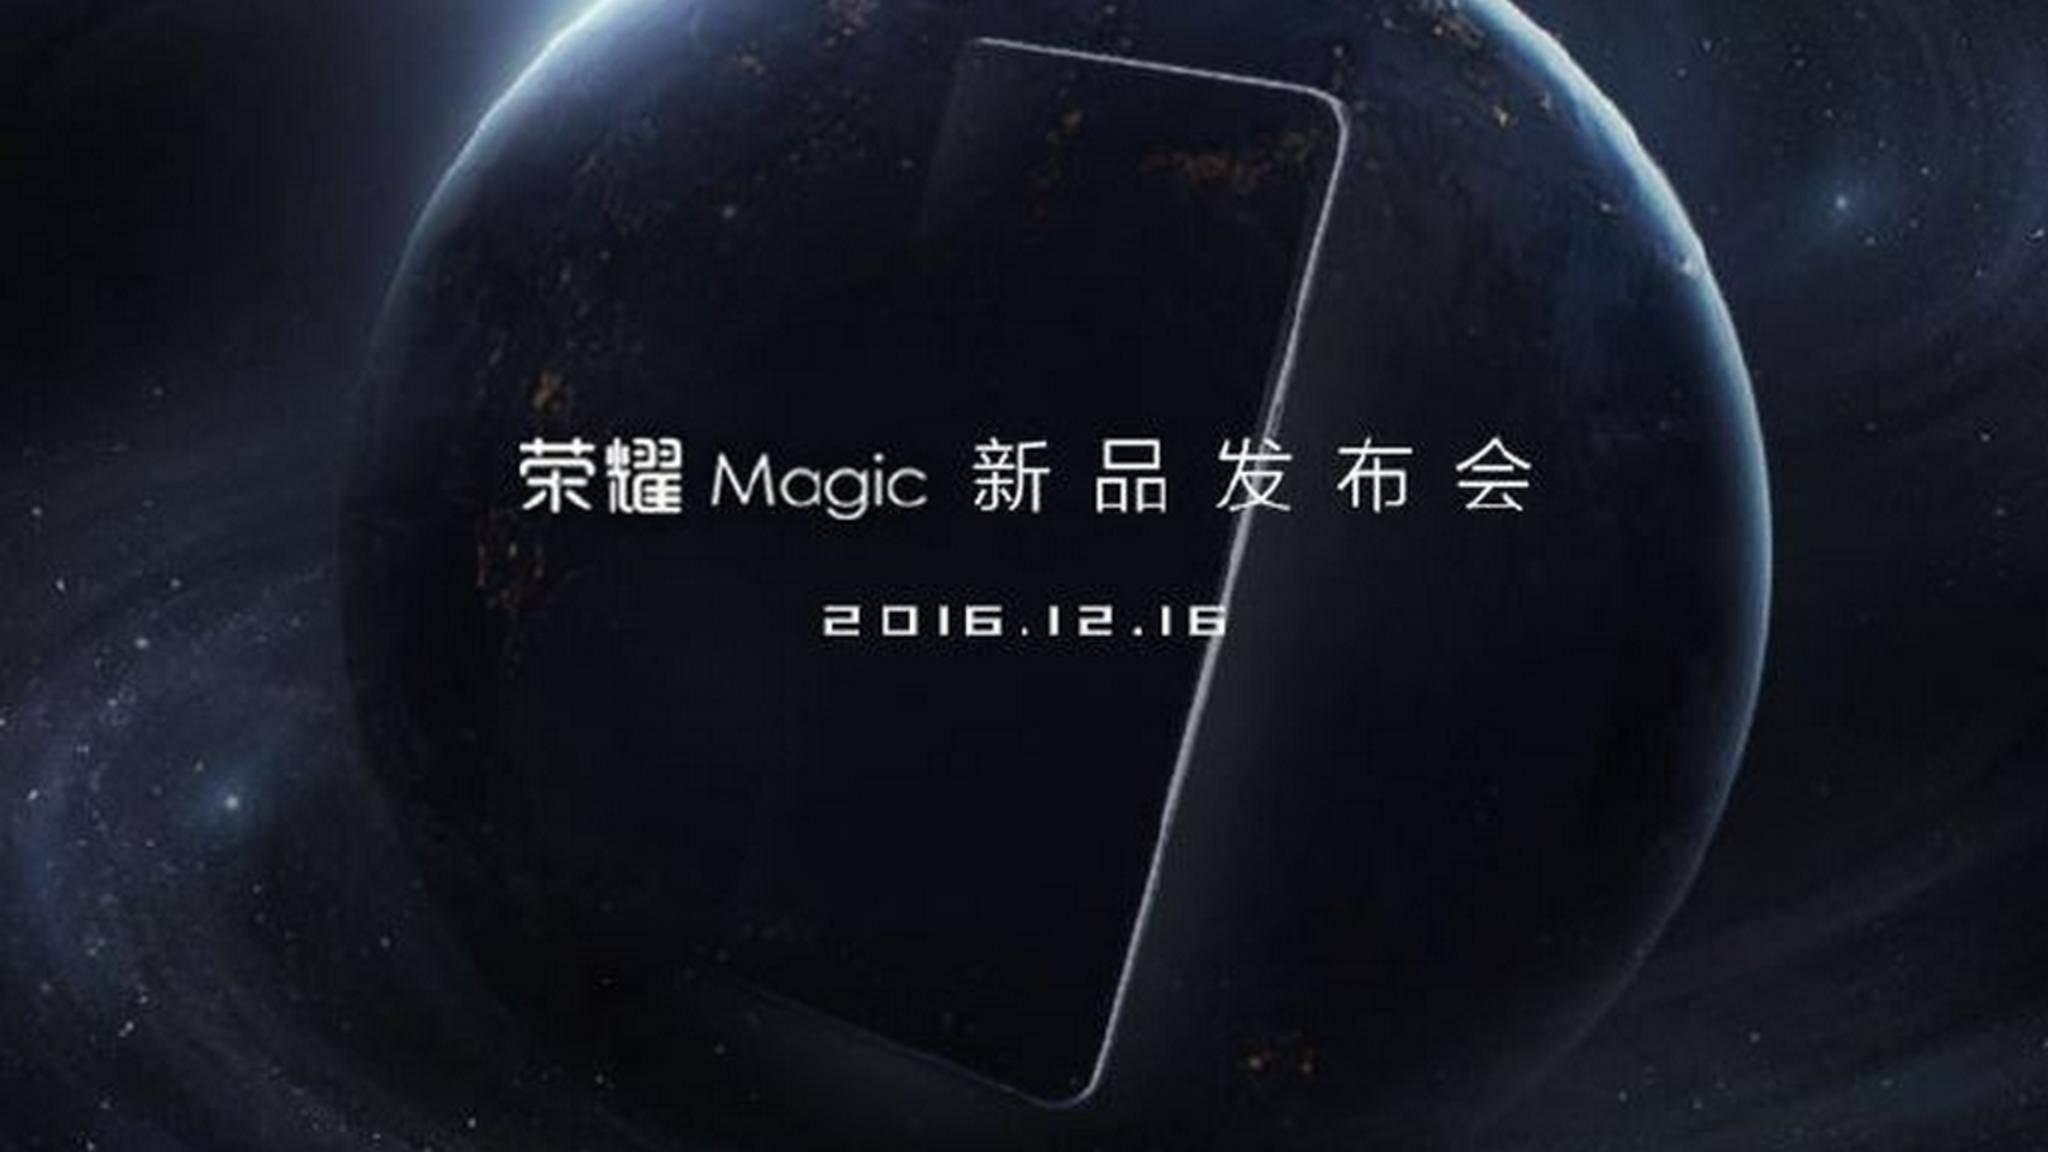 Das Honor Magic soll am 16. Dezember gezeigt werden.